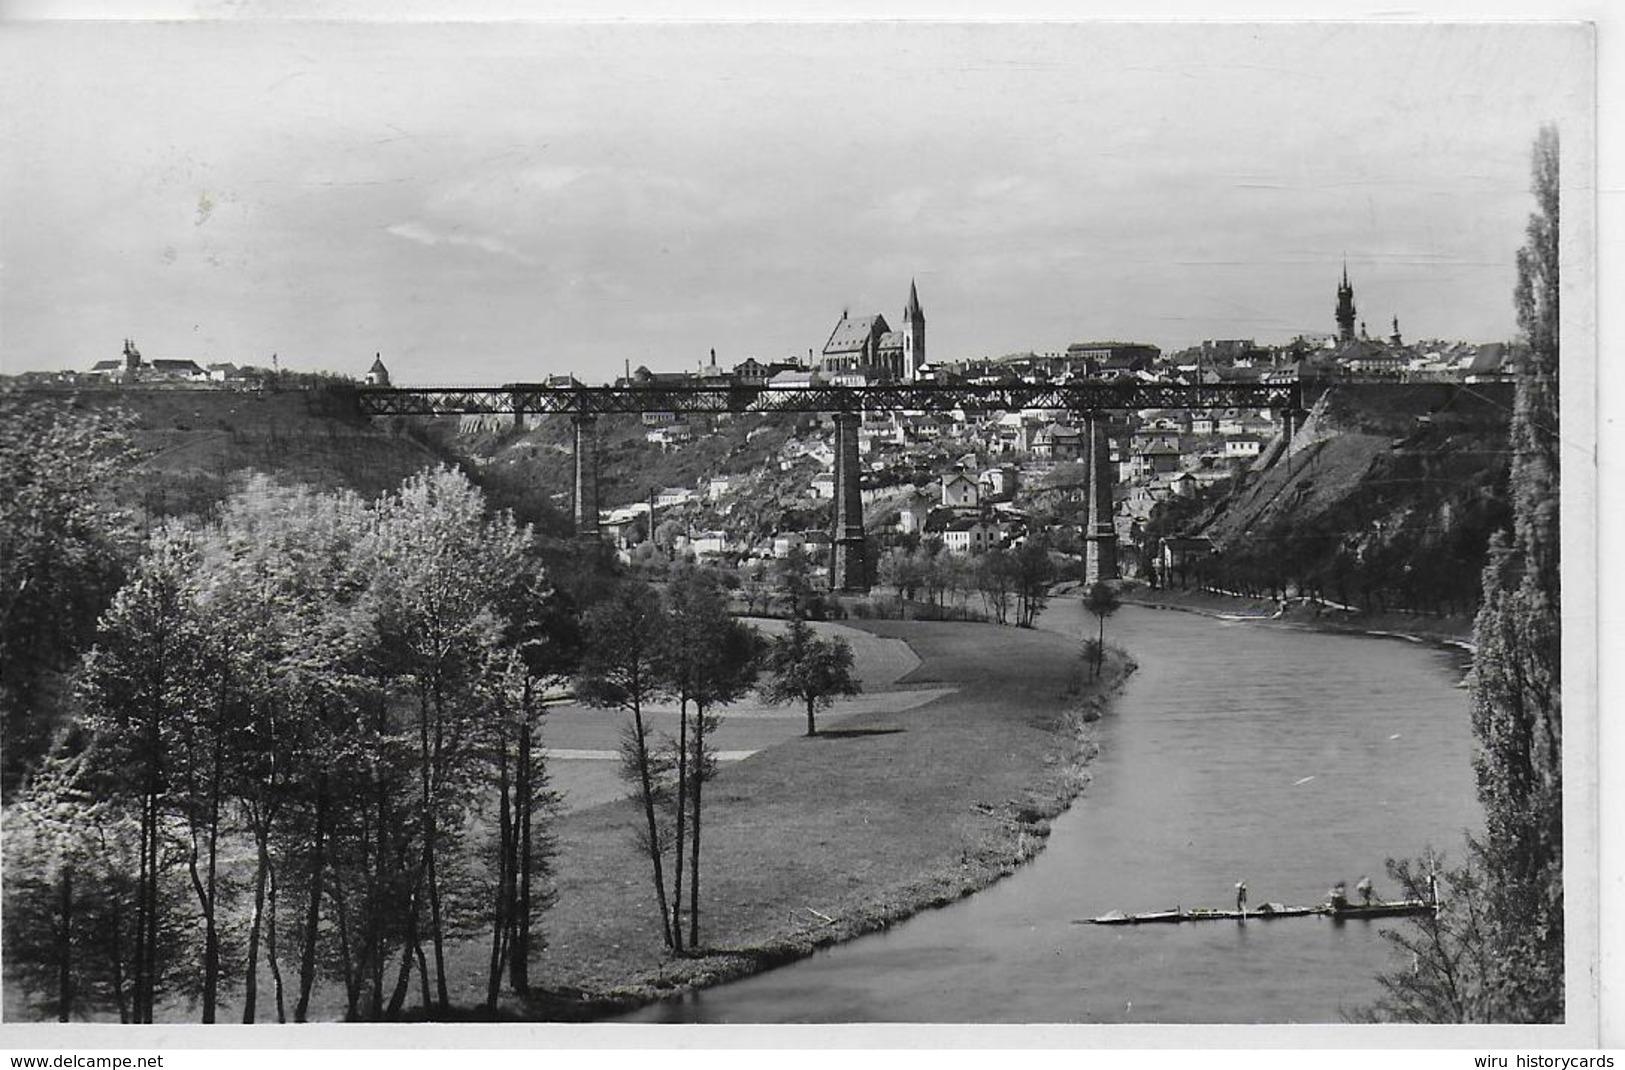 AK 0109  Znaim ( Znojmo ) Um 1930-40 - Tschechische Republik